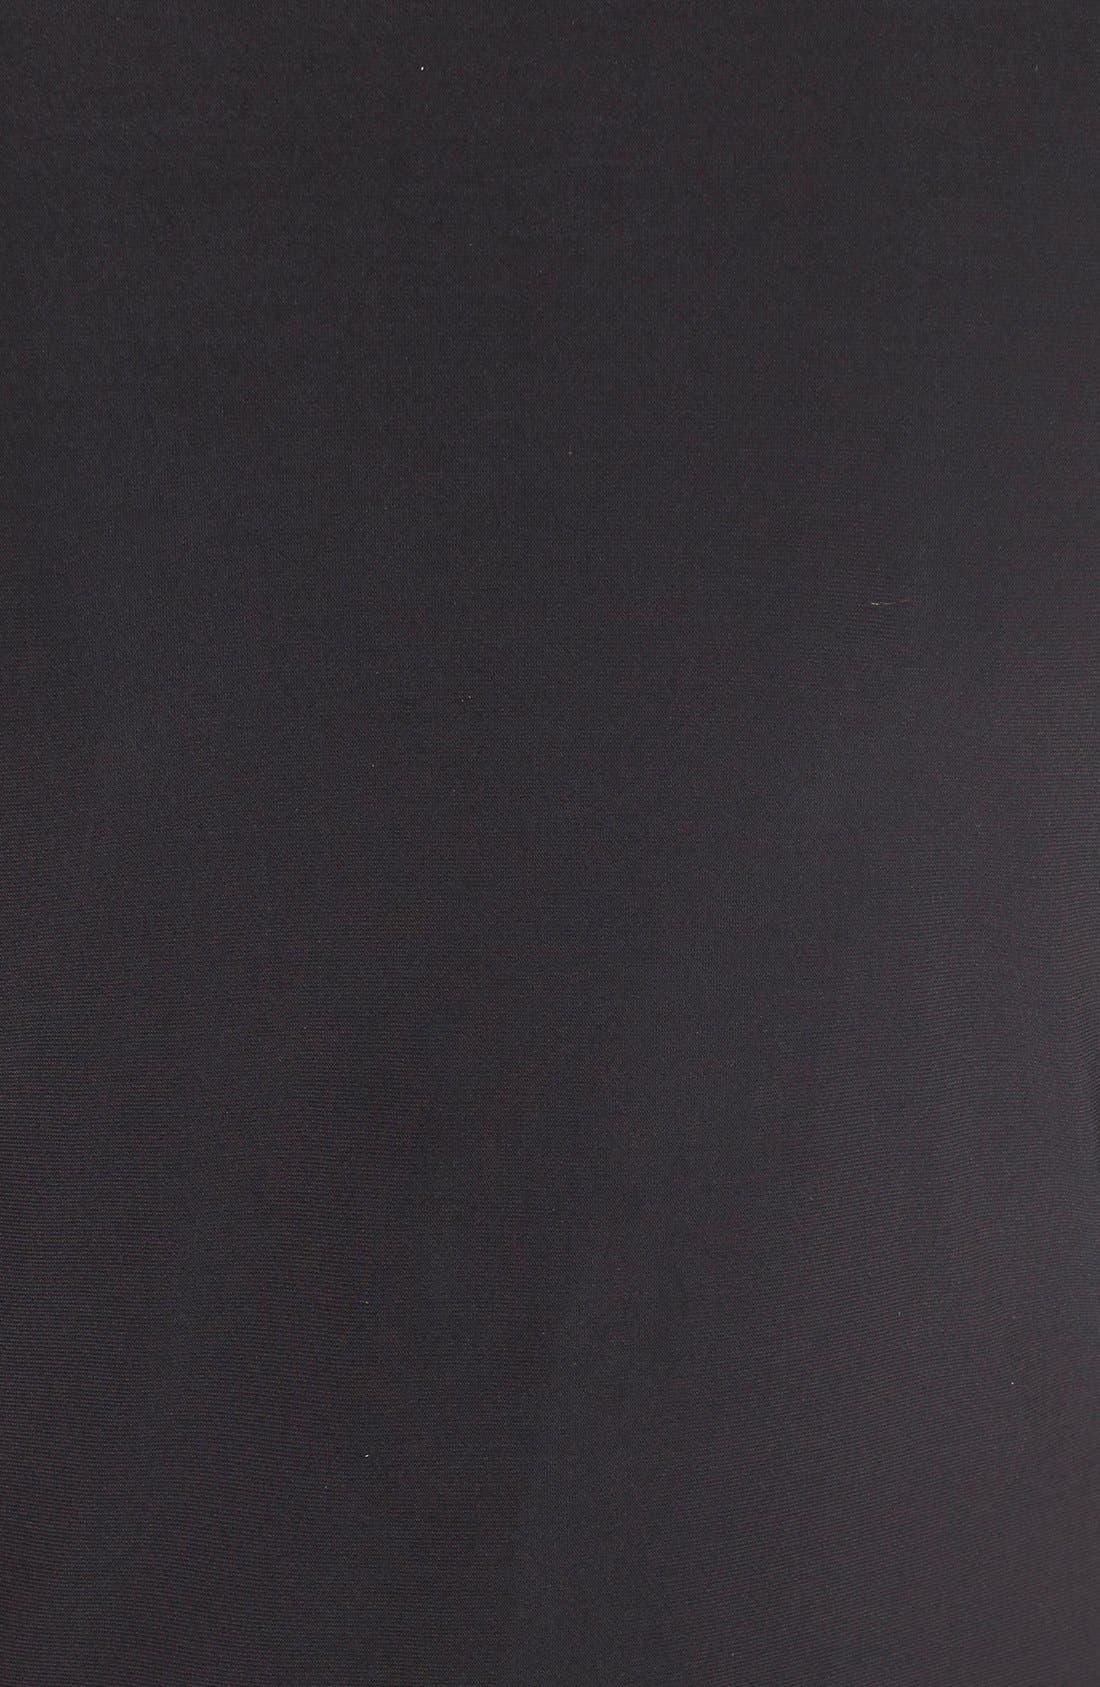 Matte Jersey Faux Wrap Fit & Flare Dress,                             Alternate thumbnail 5, color,                             Black Onyx